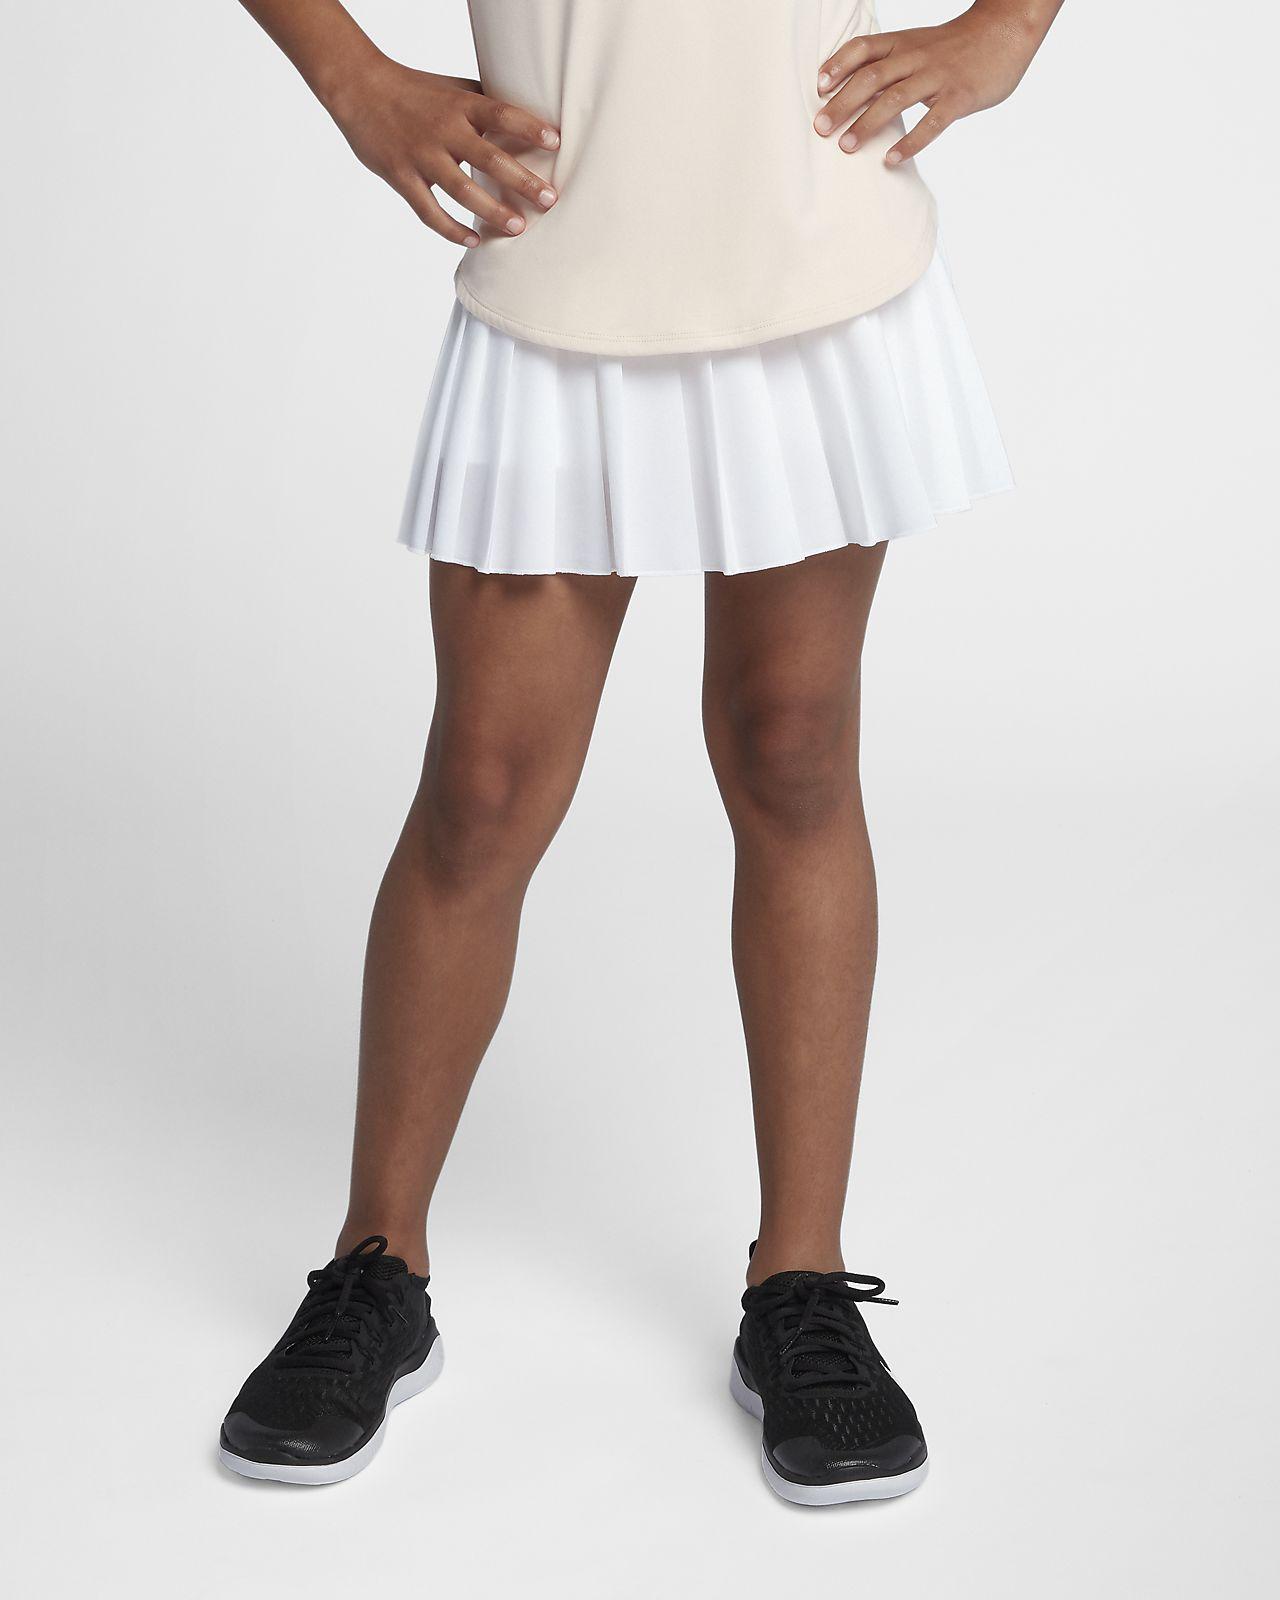 Saia de ténis NikeCourt Victory Júnior (Rapariga)